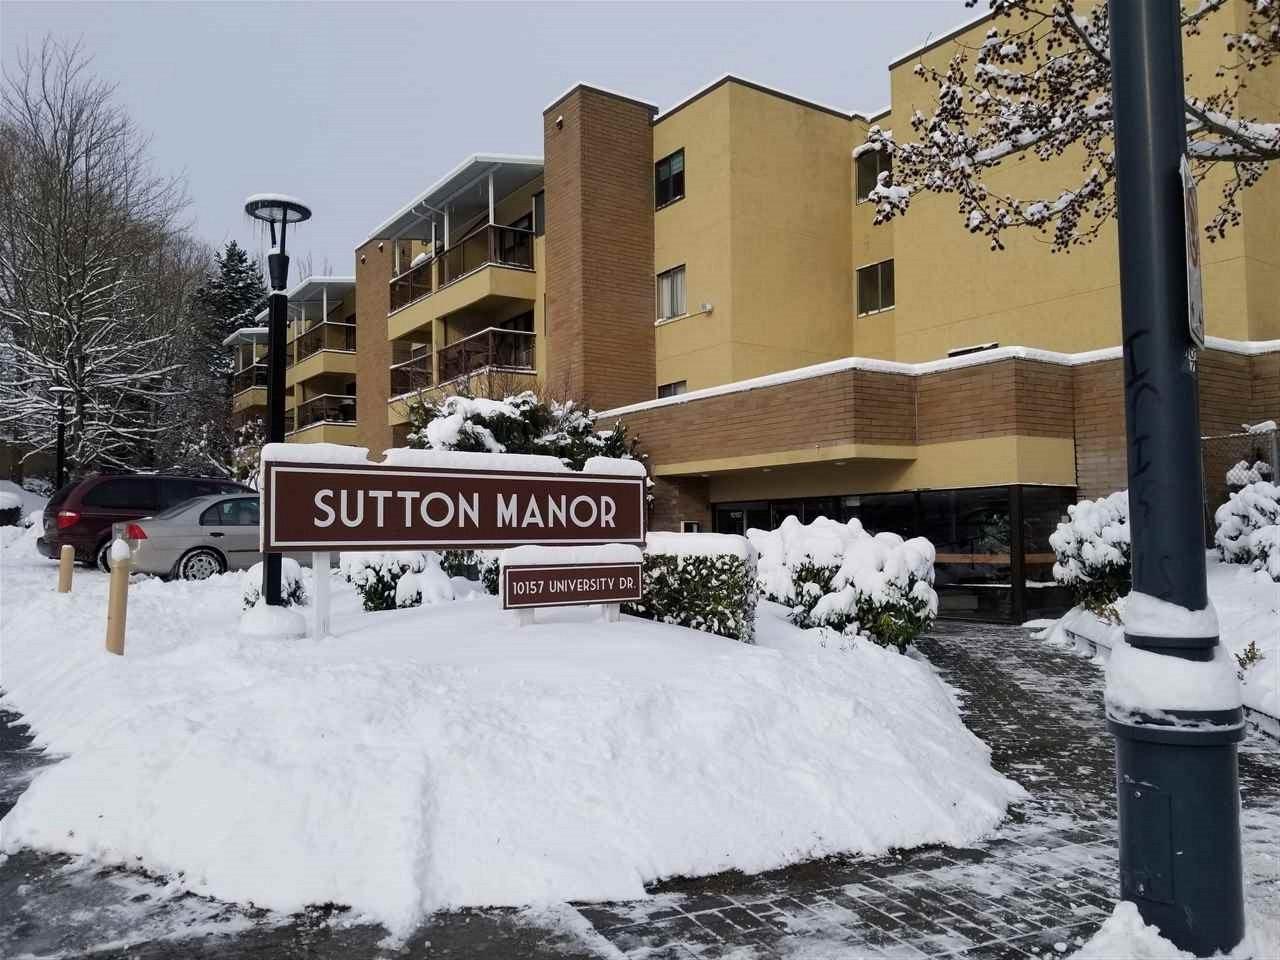 Buliding: 10157 University Drive, Surrey, BC